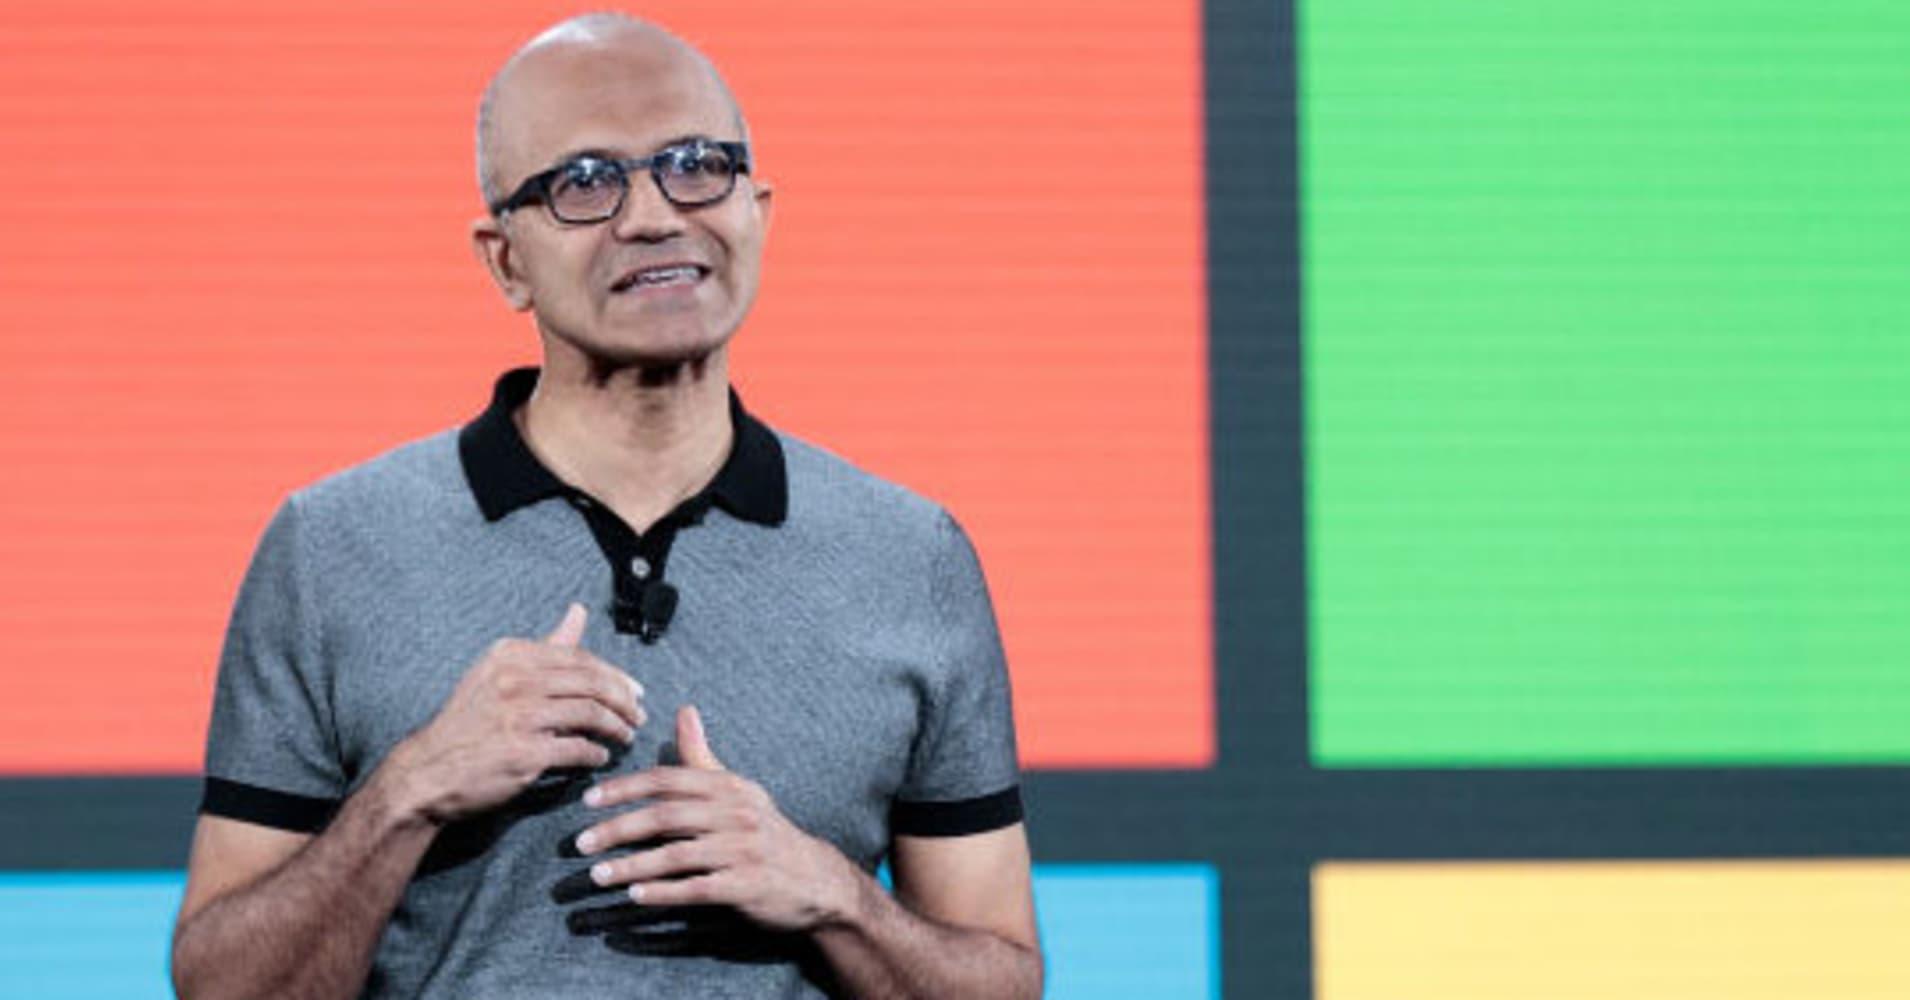 Microsoft Cortana is finally playing catch-up with Amazon Alexa